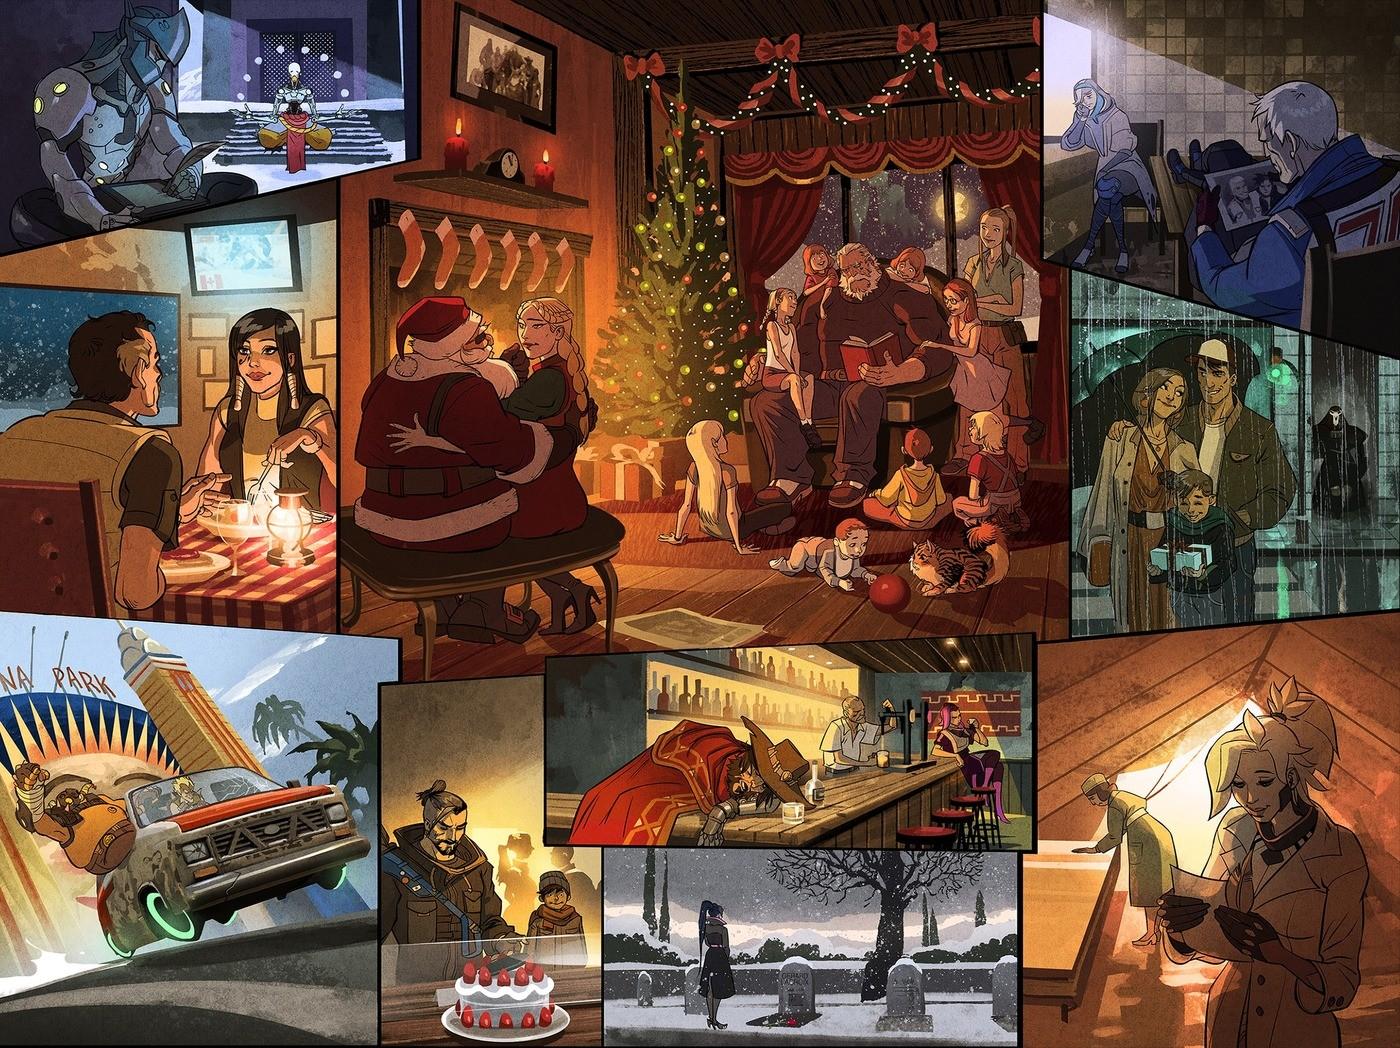 Overwatch Christmas.Overwatch Christmas Time